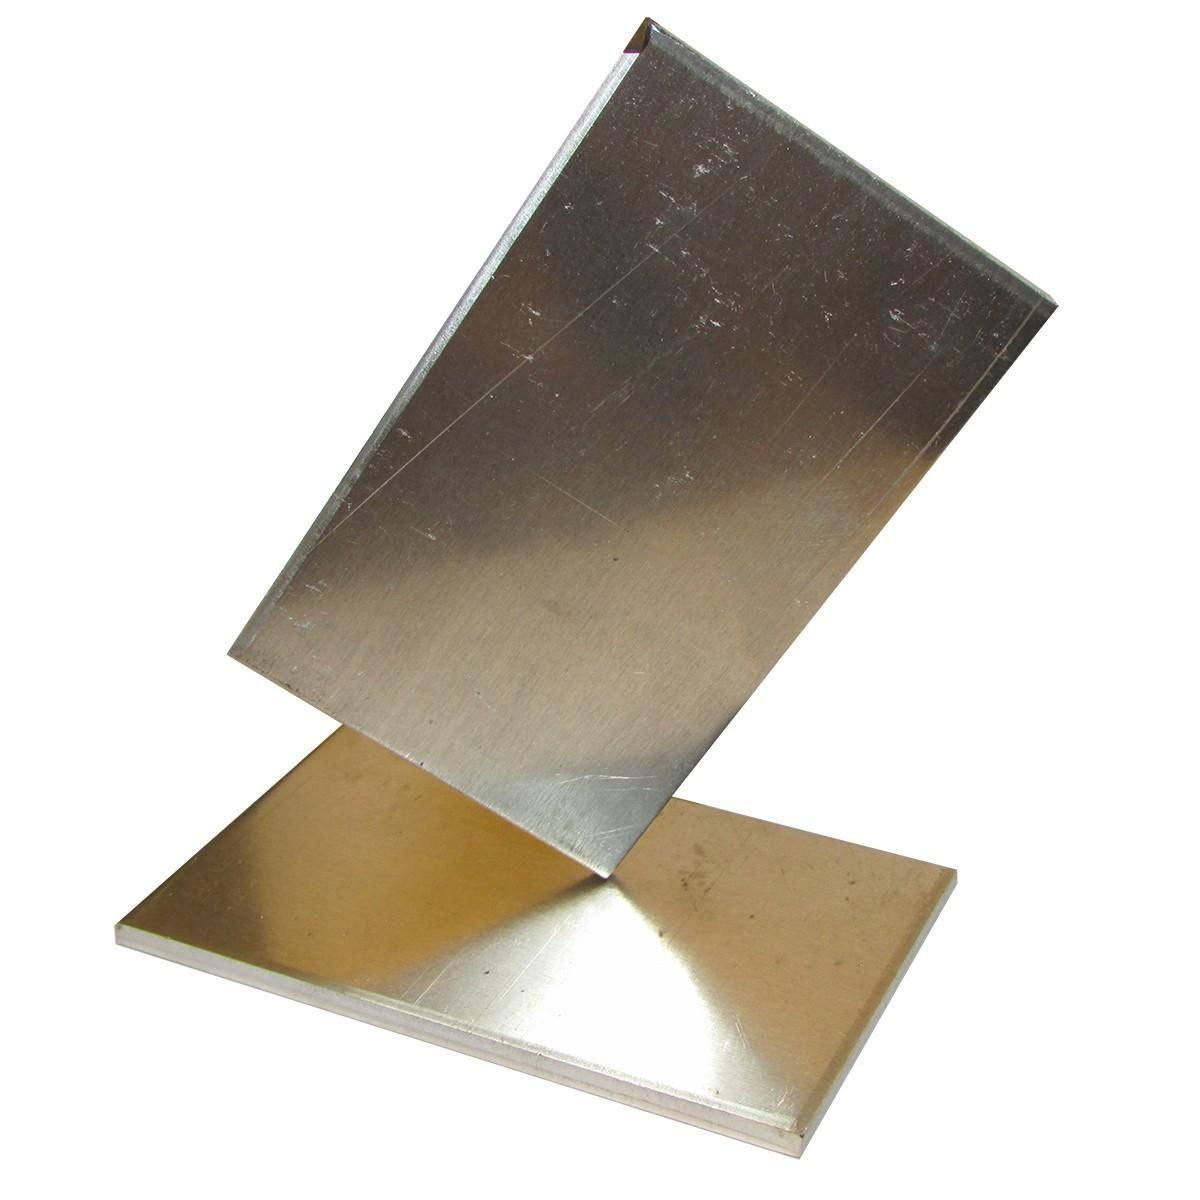 "Aluminum Mold Plates - 1-7/8"" x 2-7/8"""